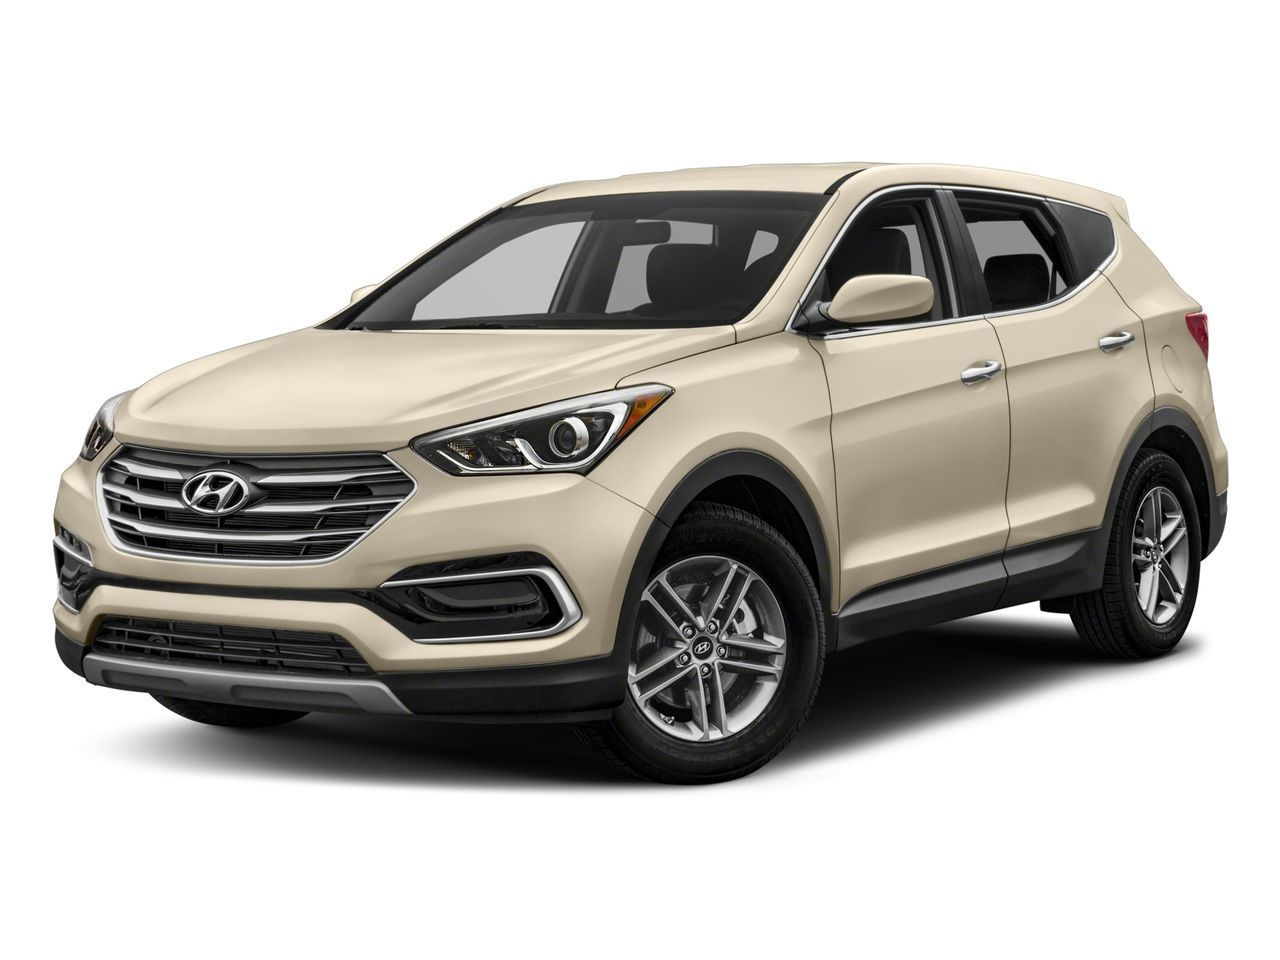 Hyundai Santa Fe Sport 2018 4 Door Suv Santa Fe Sport Hyundai Santa Fe Sport Hyundai Santa Fe